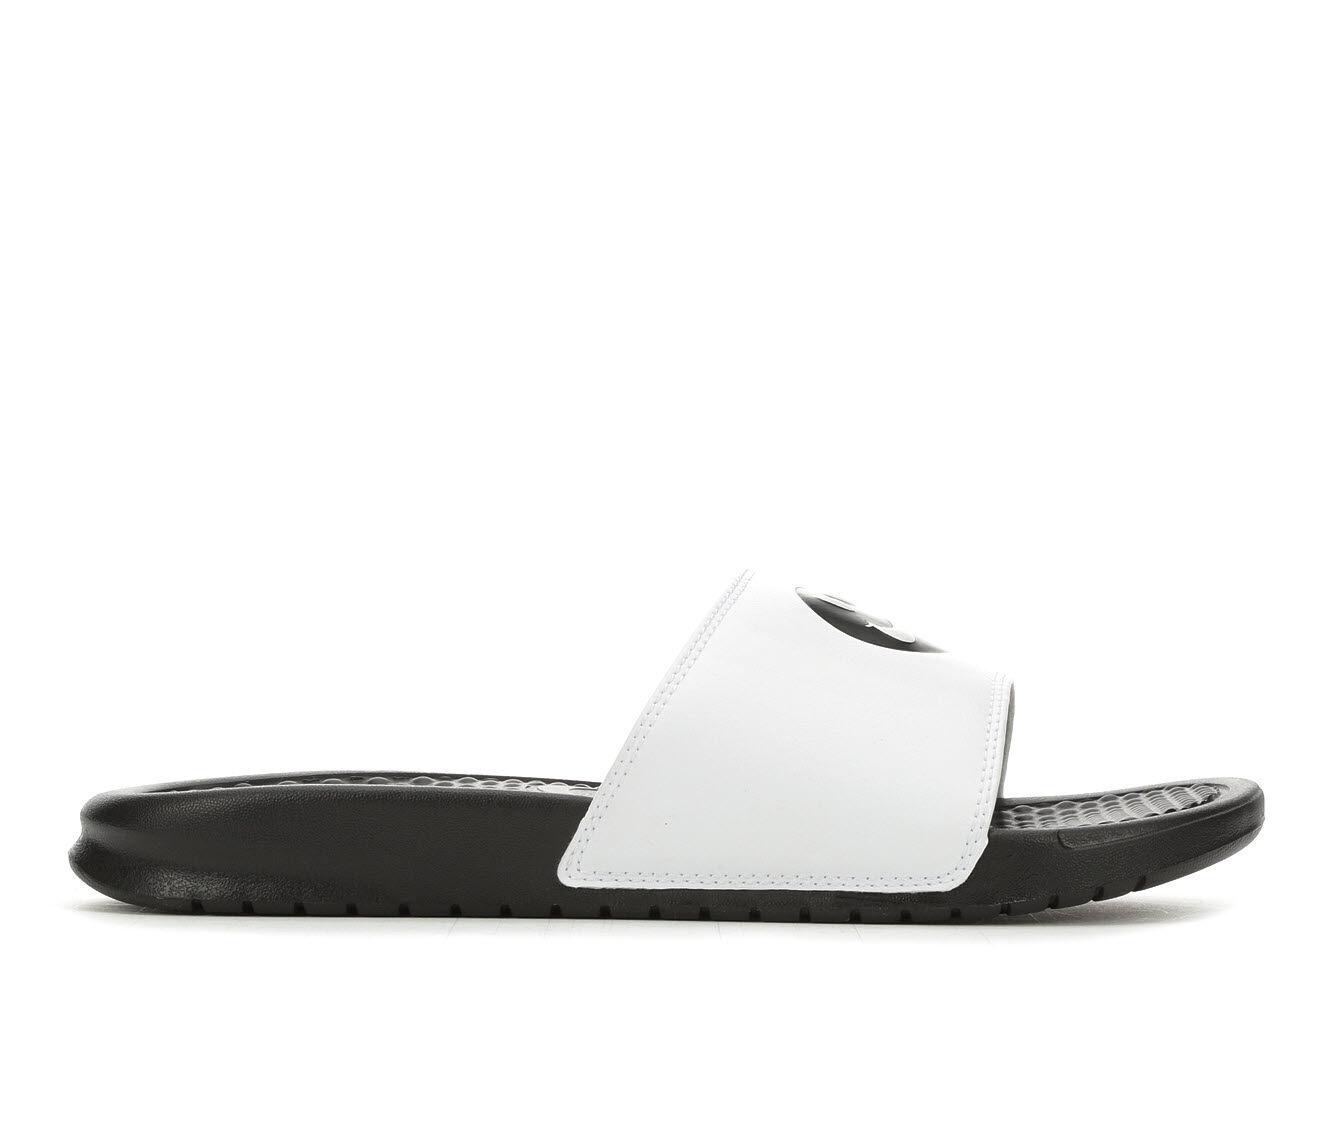 uk shoes_kd2616